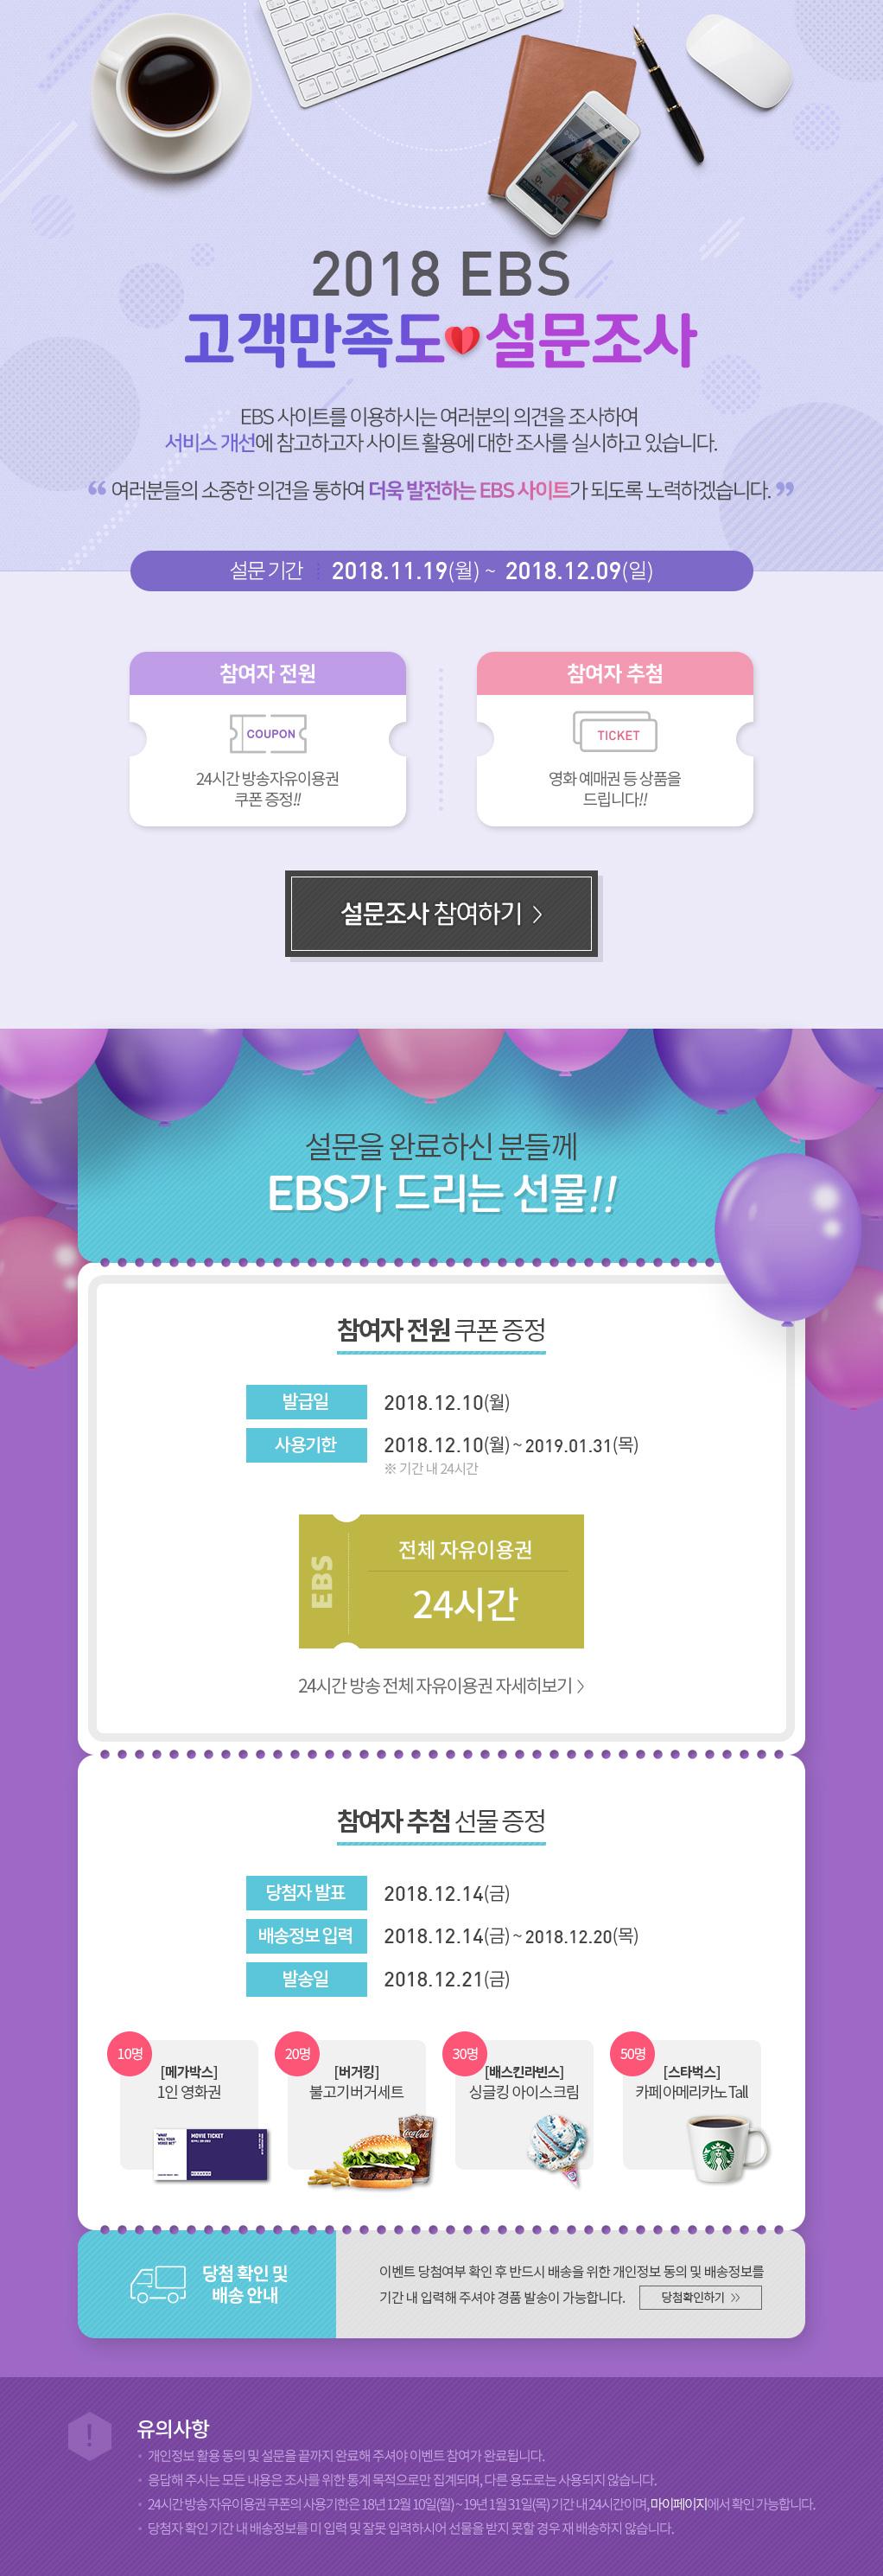 2017 EBS 시청자상 투표 이벤트